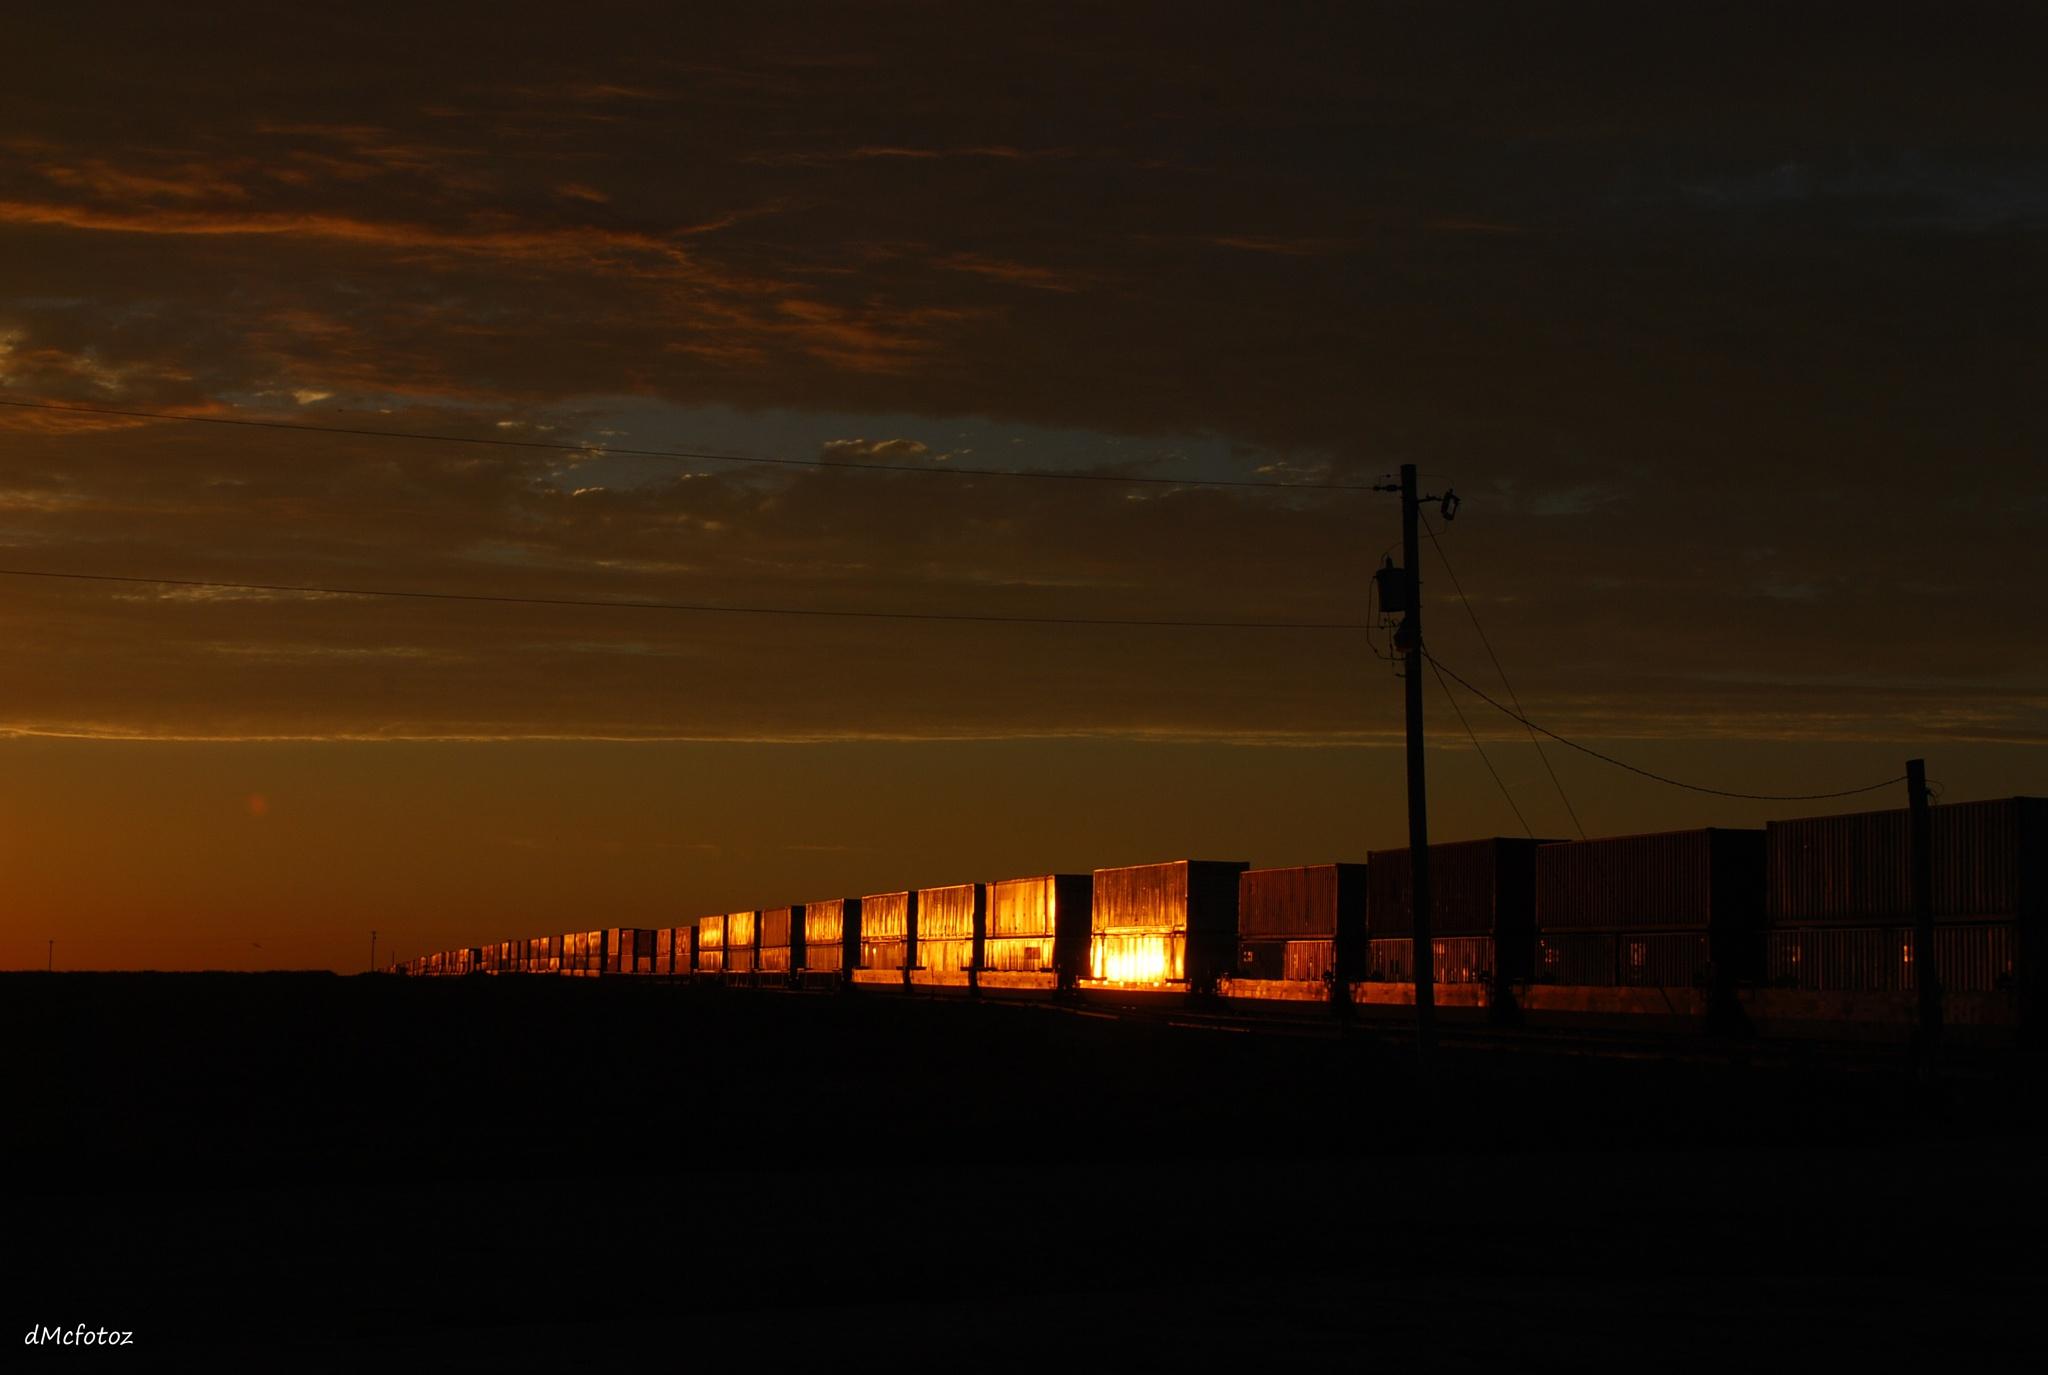 train at sunset by reddirtdiva